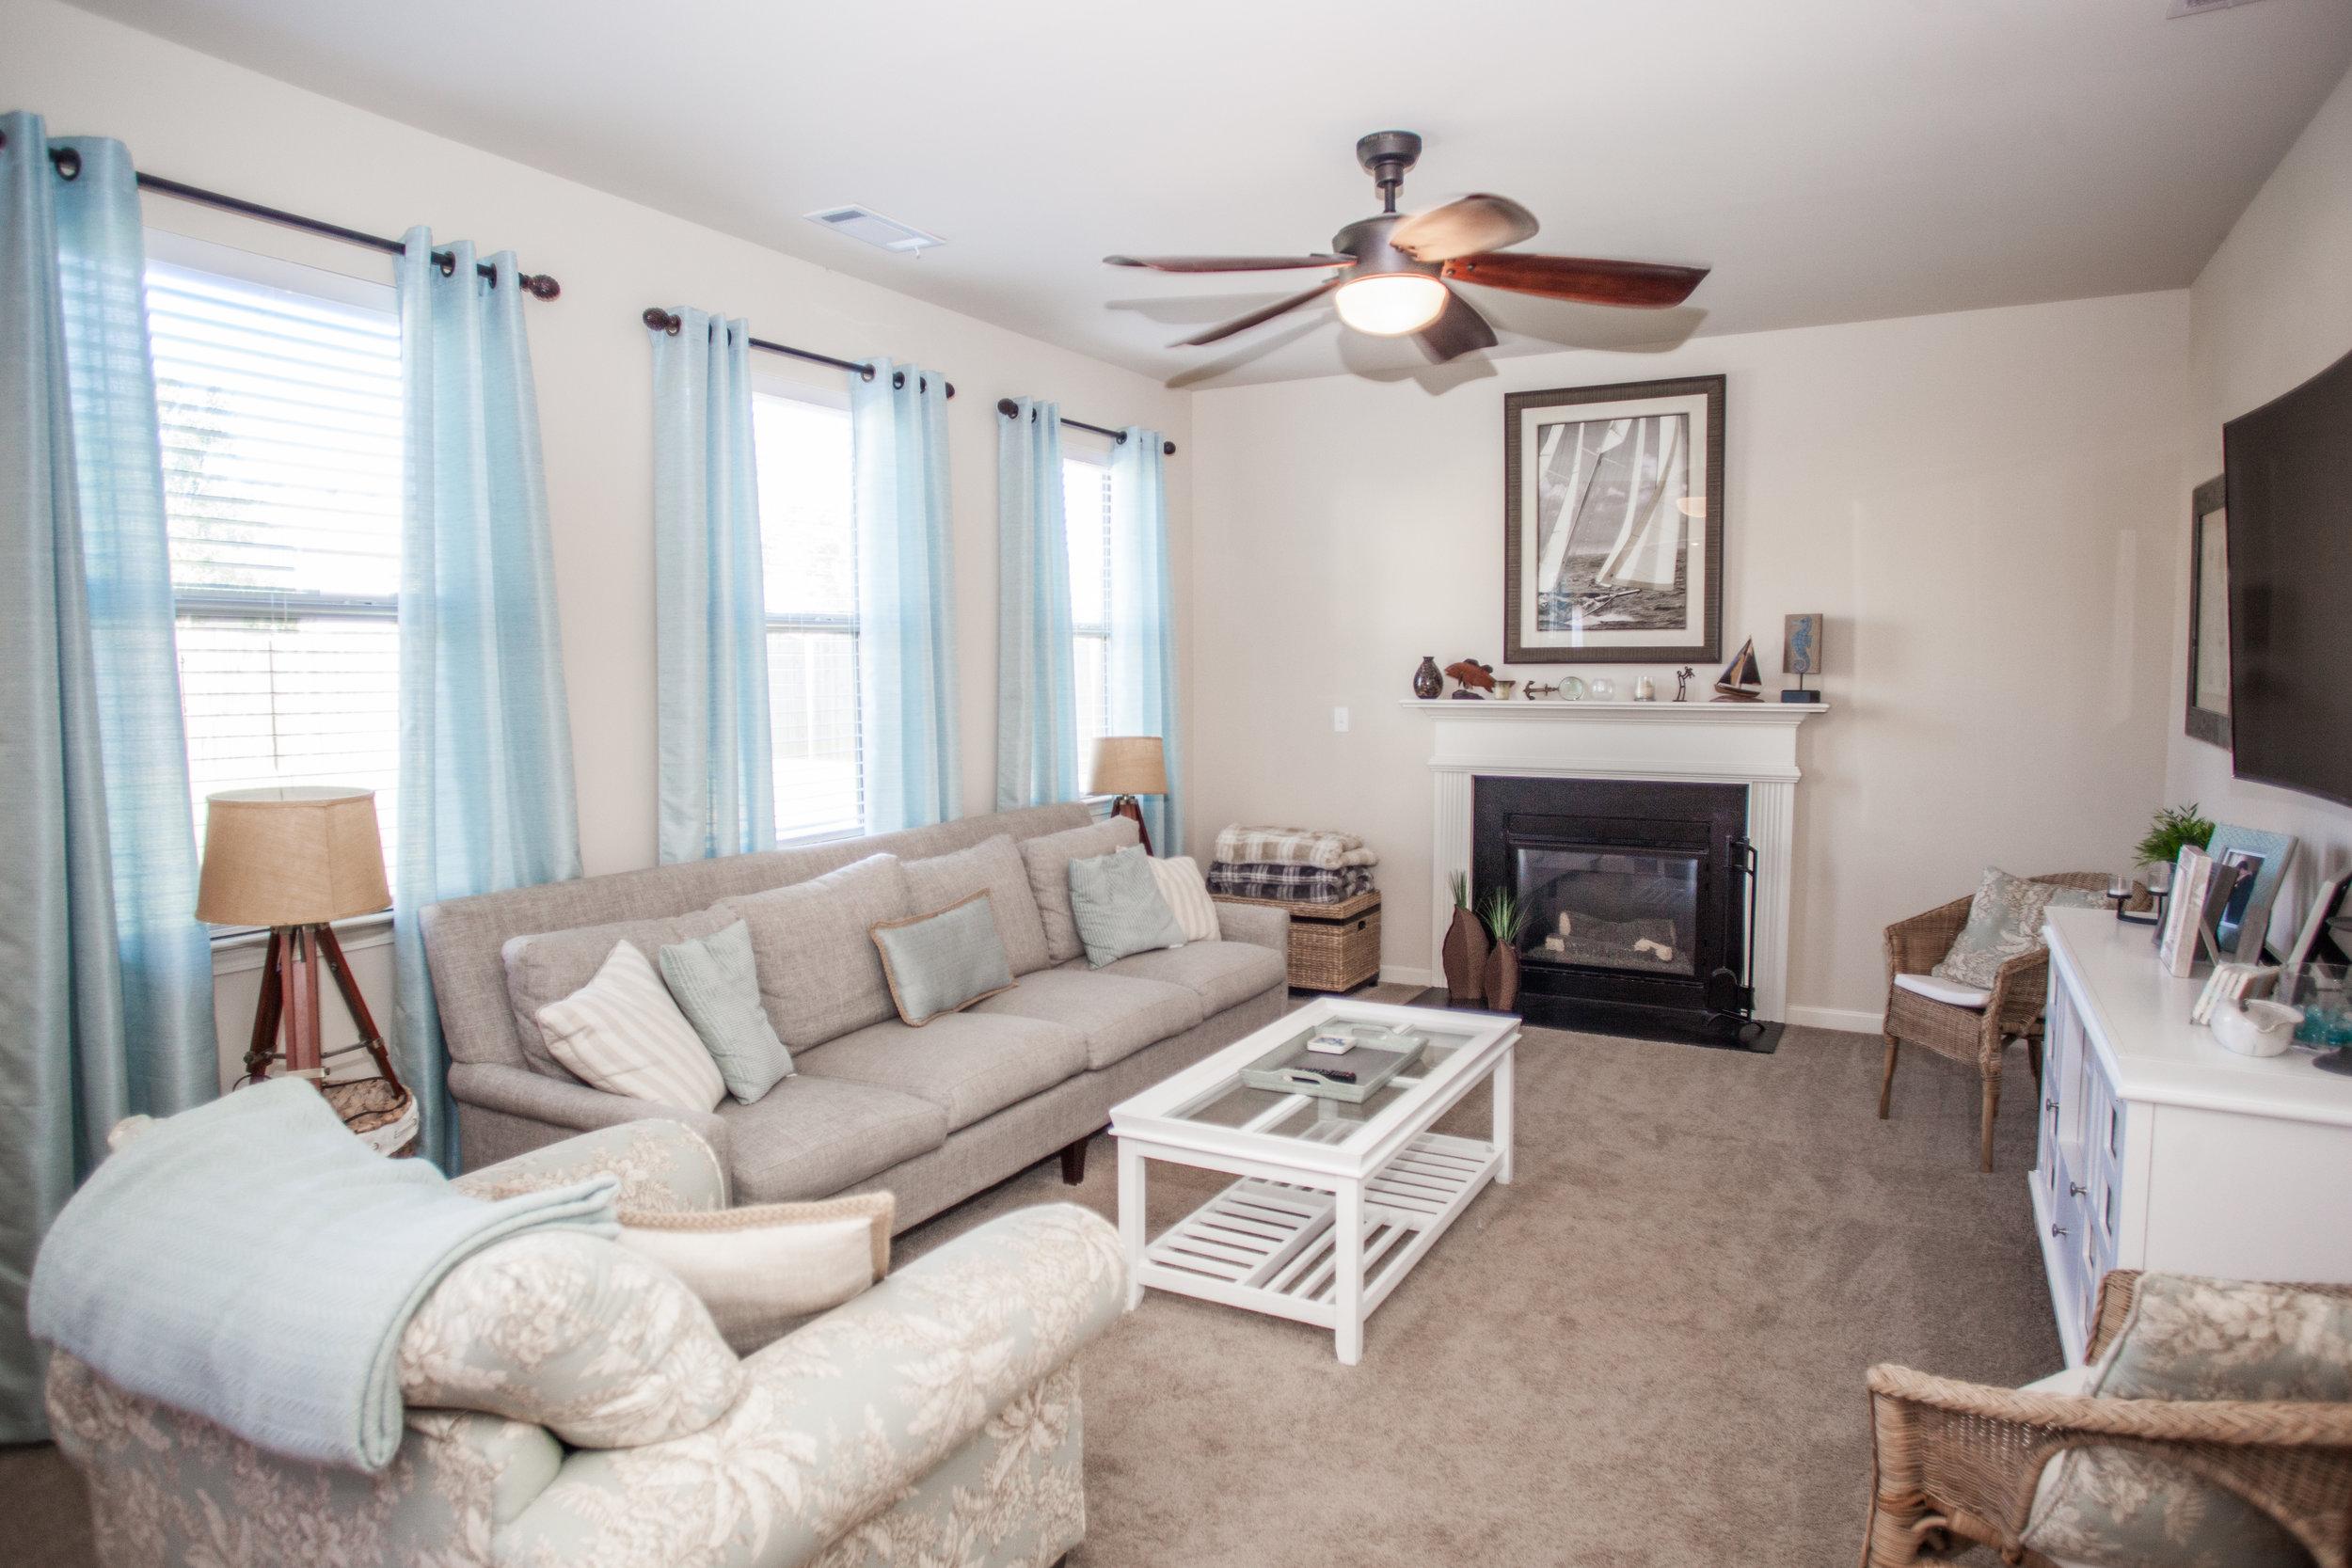 woodstock-ga-house-for-sale-wingard-real-estate-under-300k-48.jpg